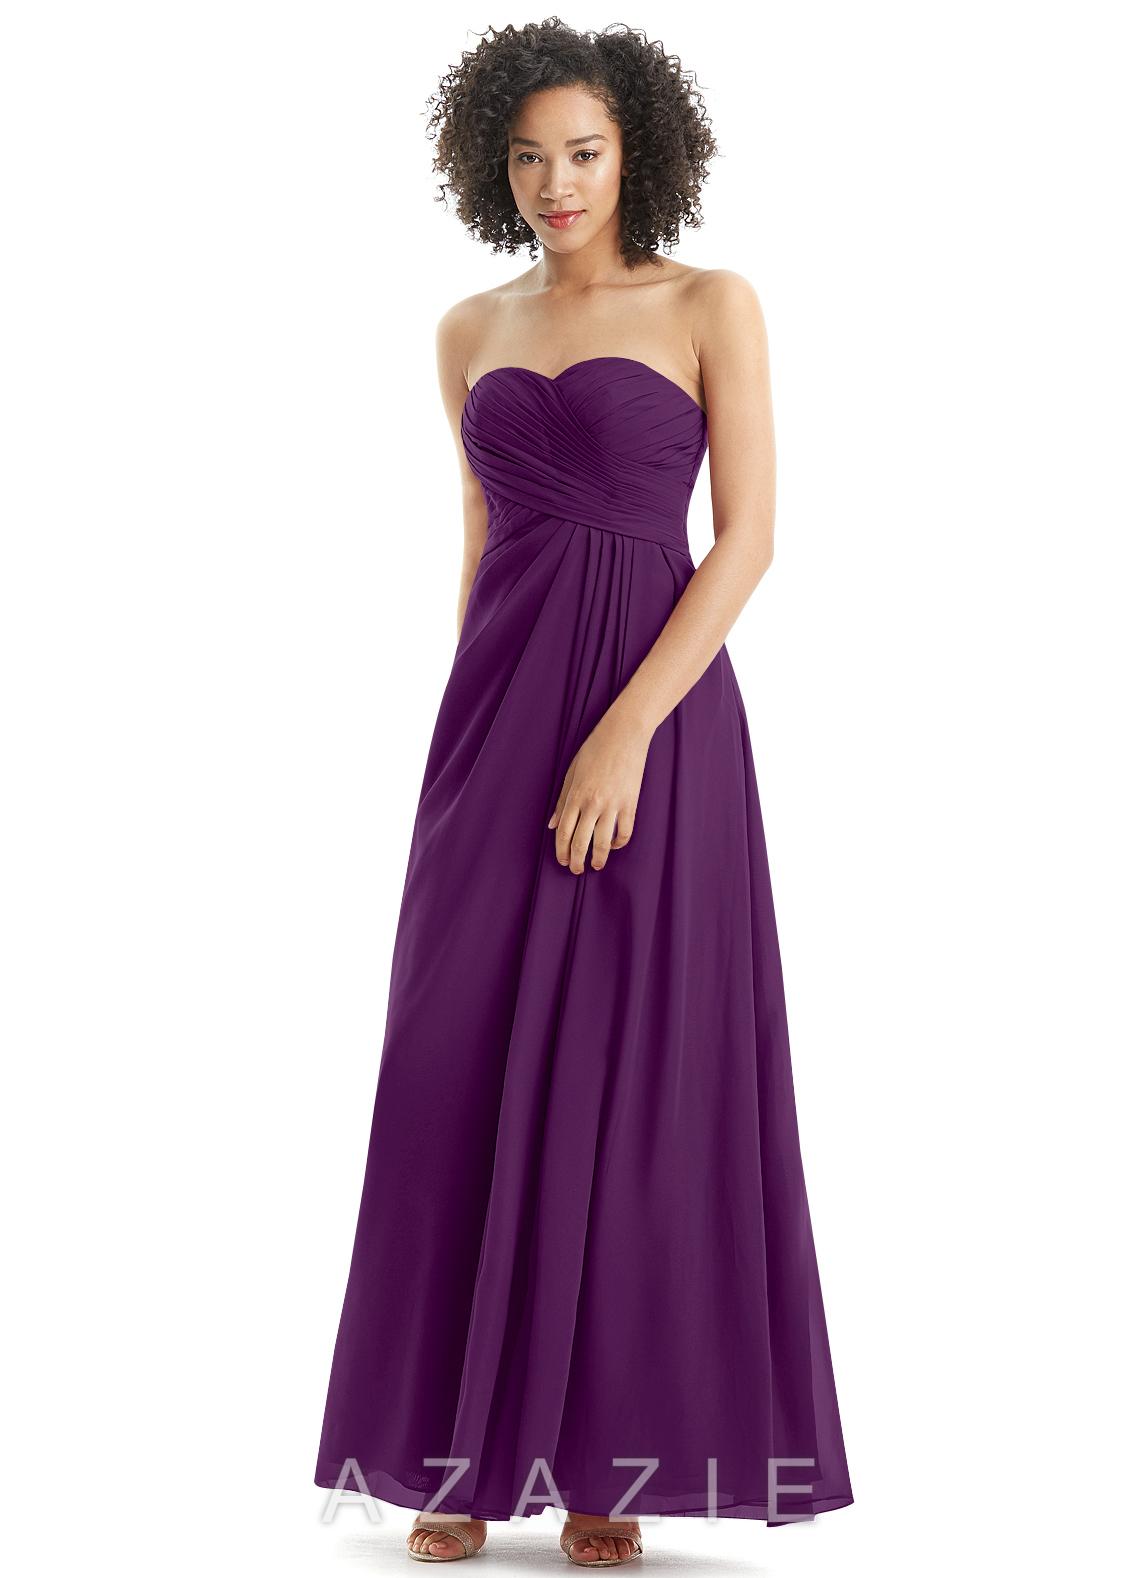 Azazie Arabella Bridesmaid Dress | Azazie